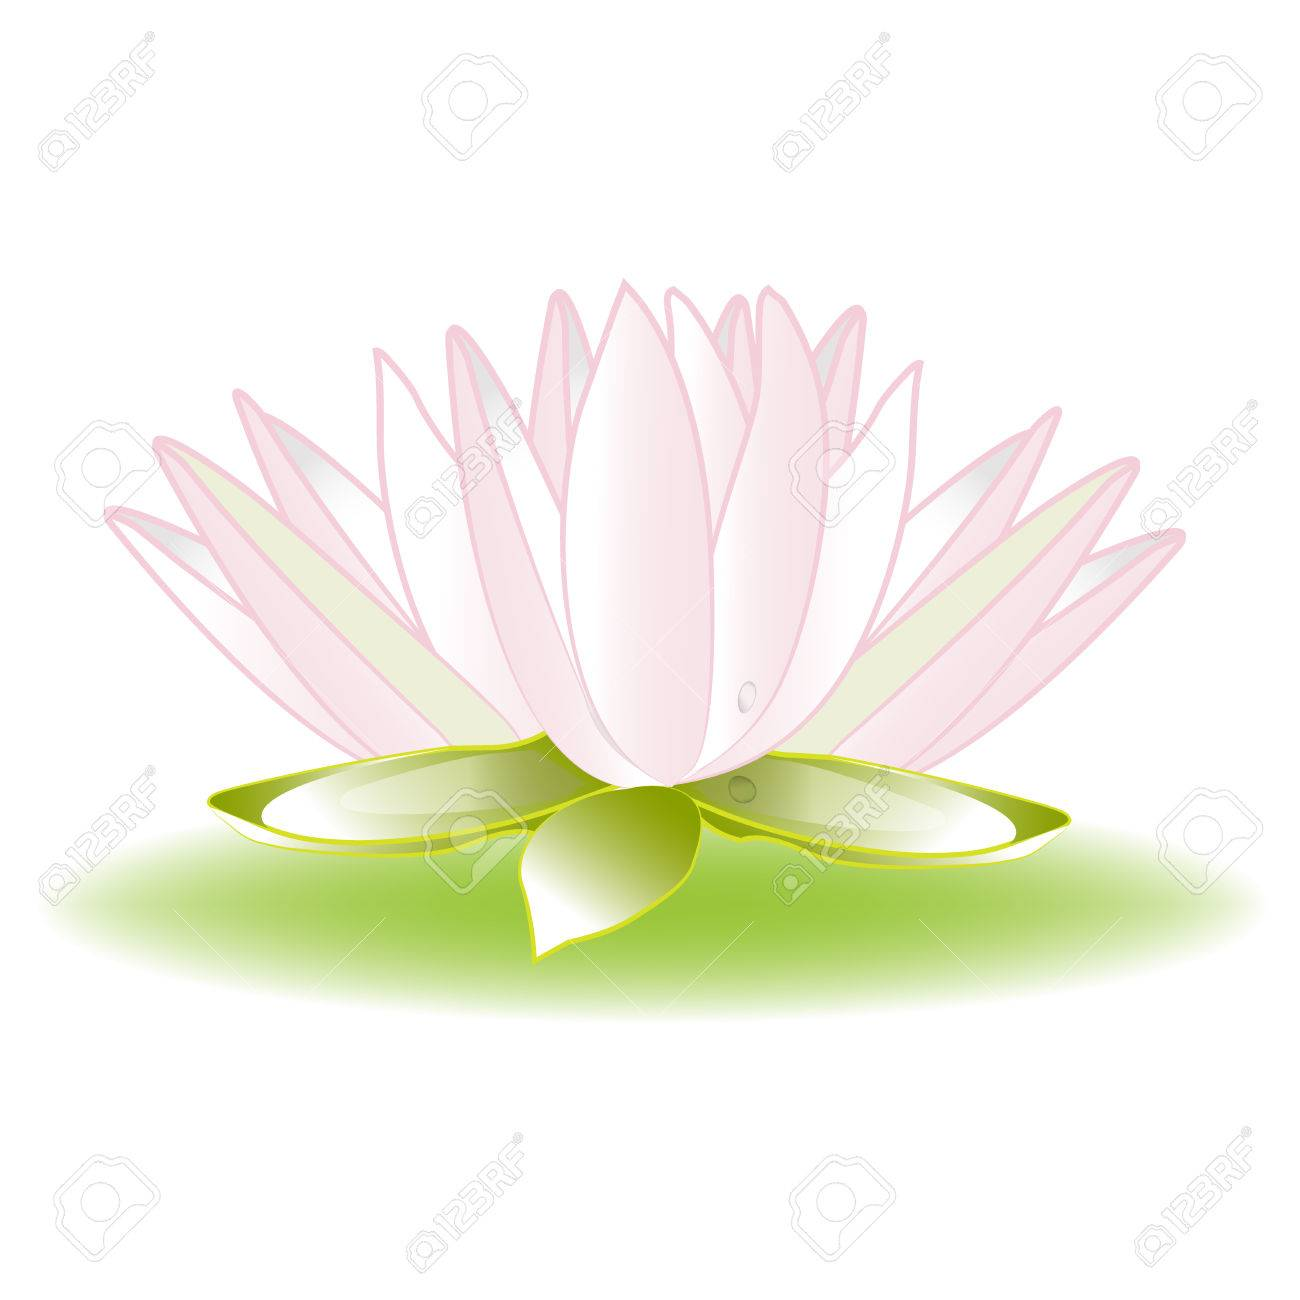 Lotus flower logo vector image icon royalty free cliparts vectors lotus flower logo vector image icon stock vector 79928344 izmirmasajfo